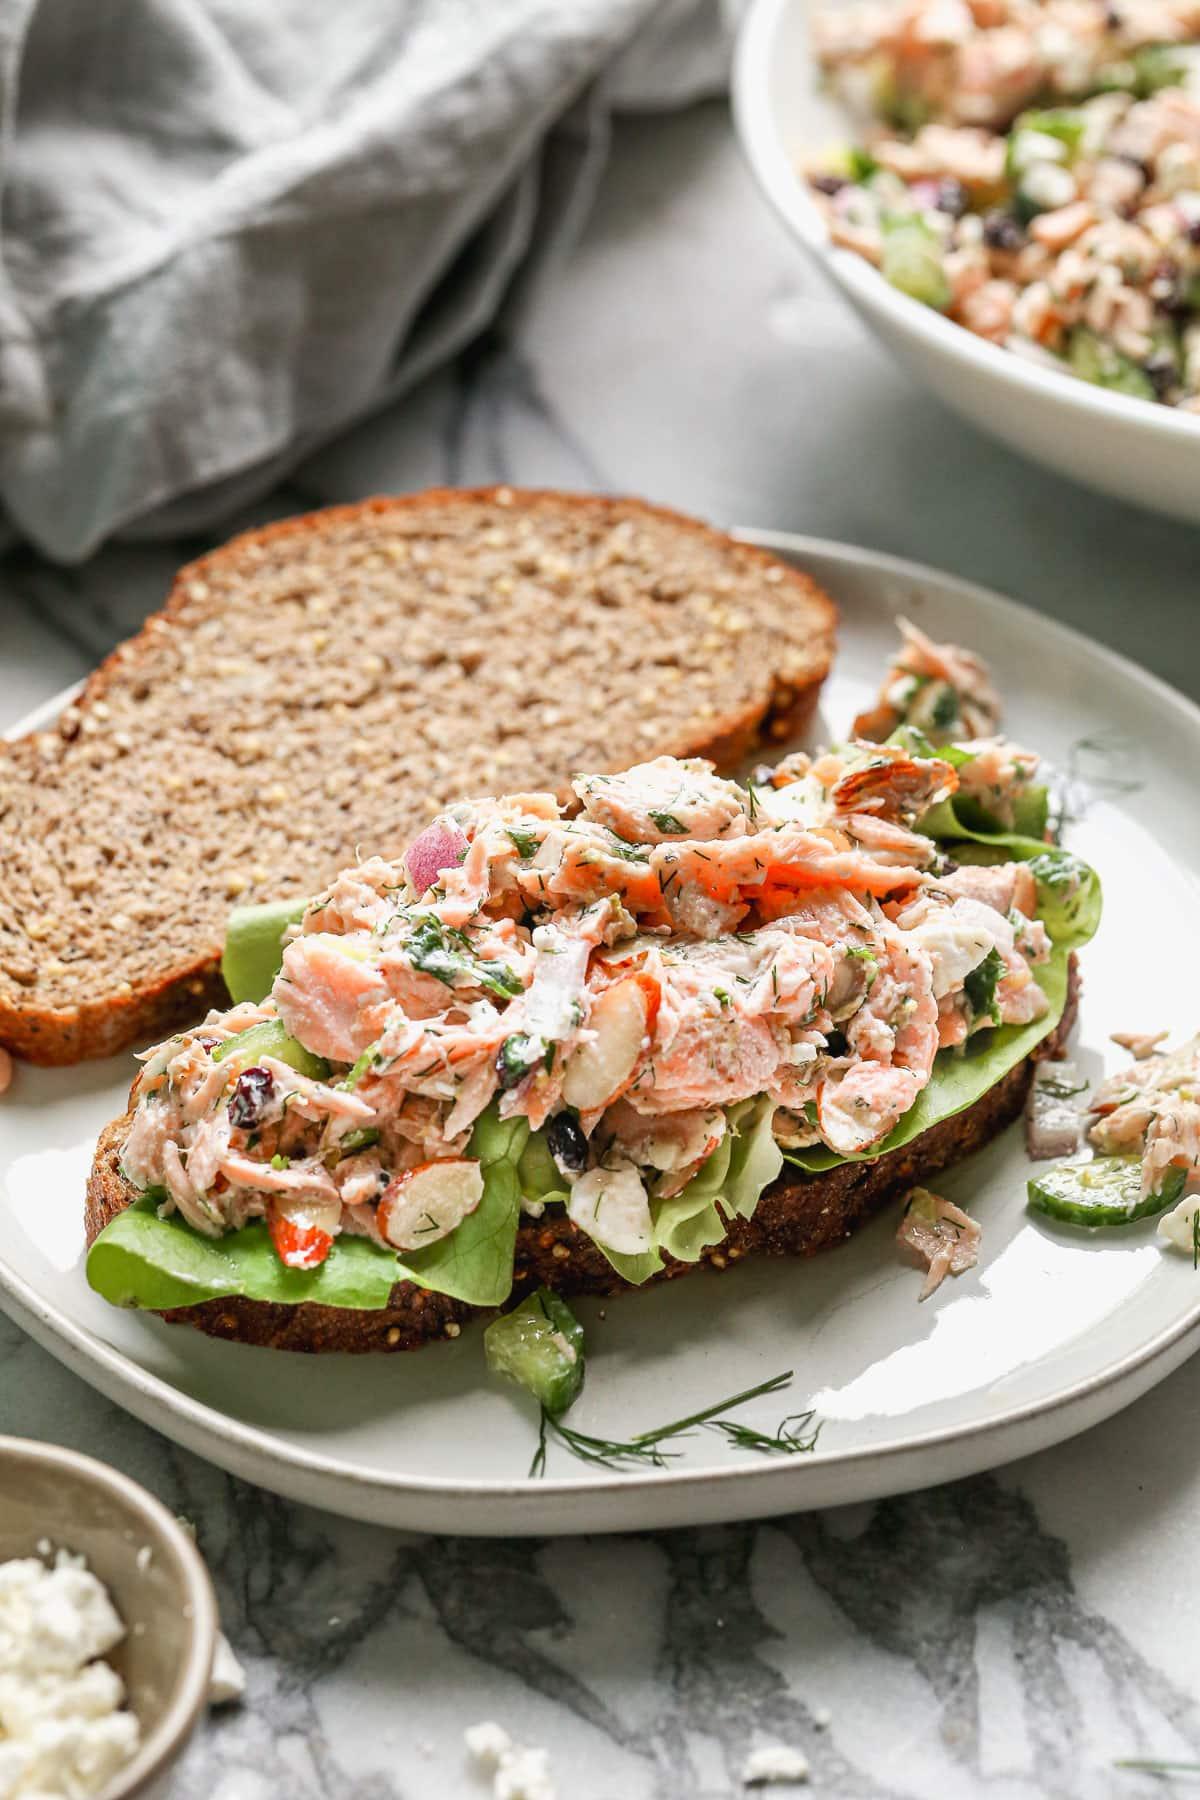 a salmon salad sandwich